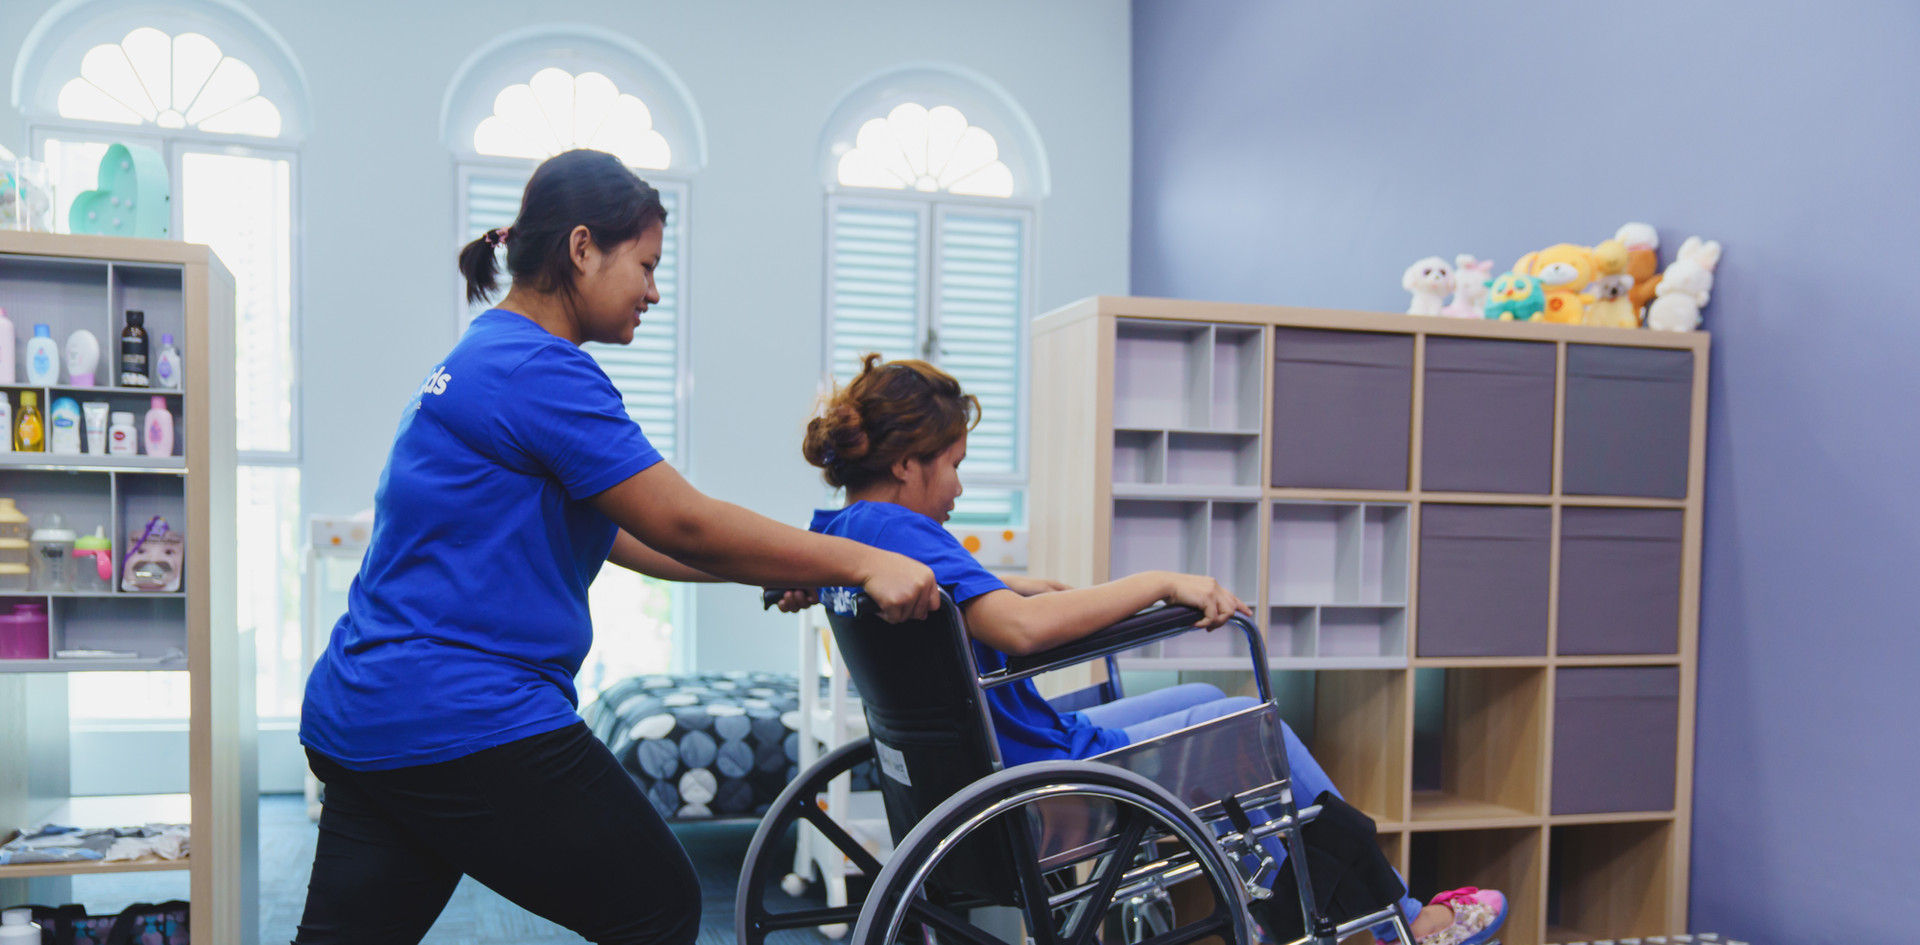 Maid Wheelchair Training